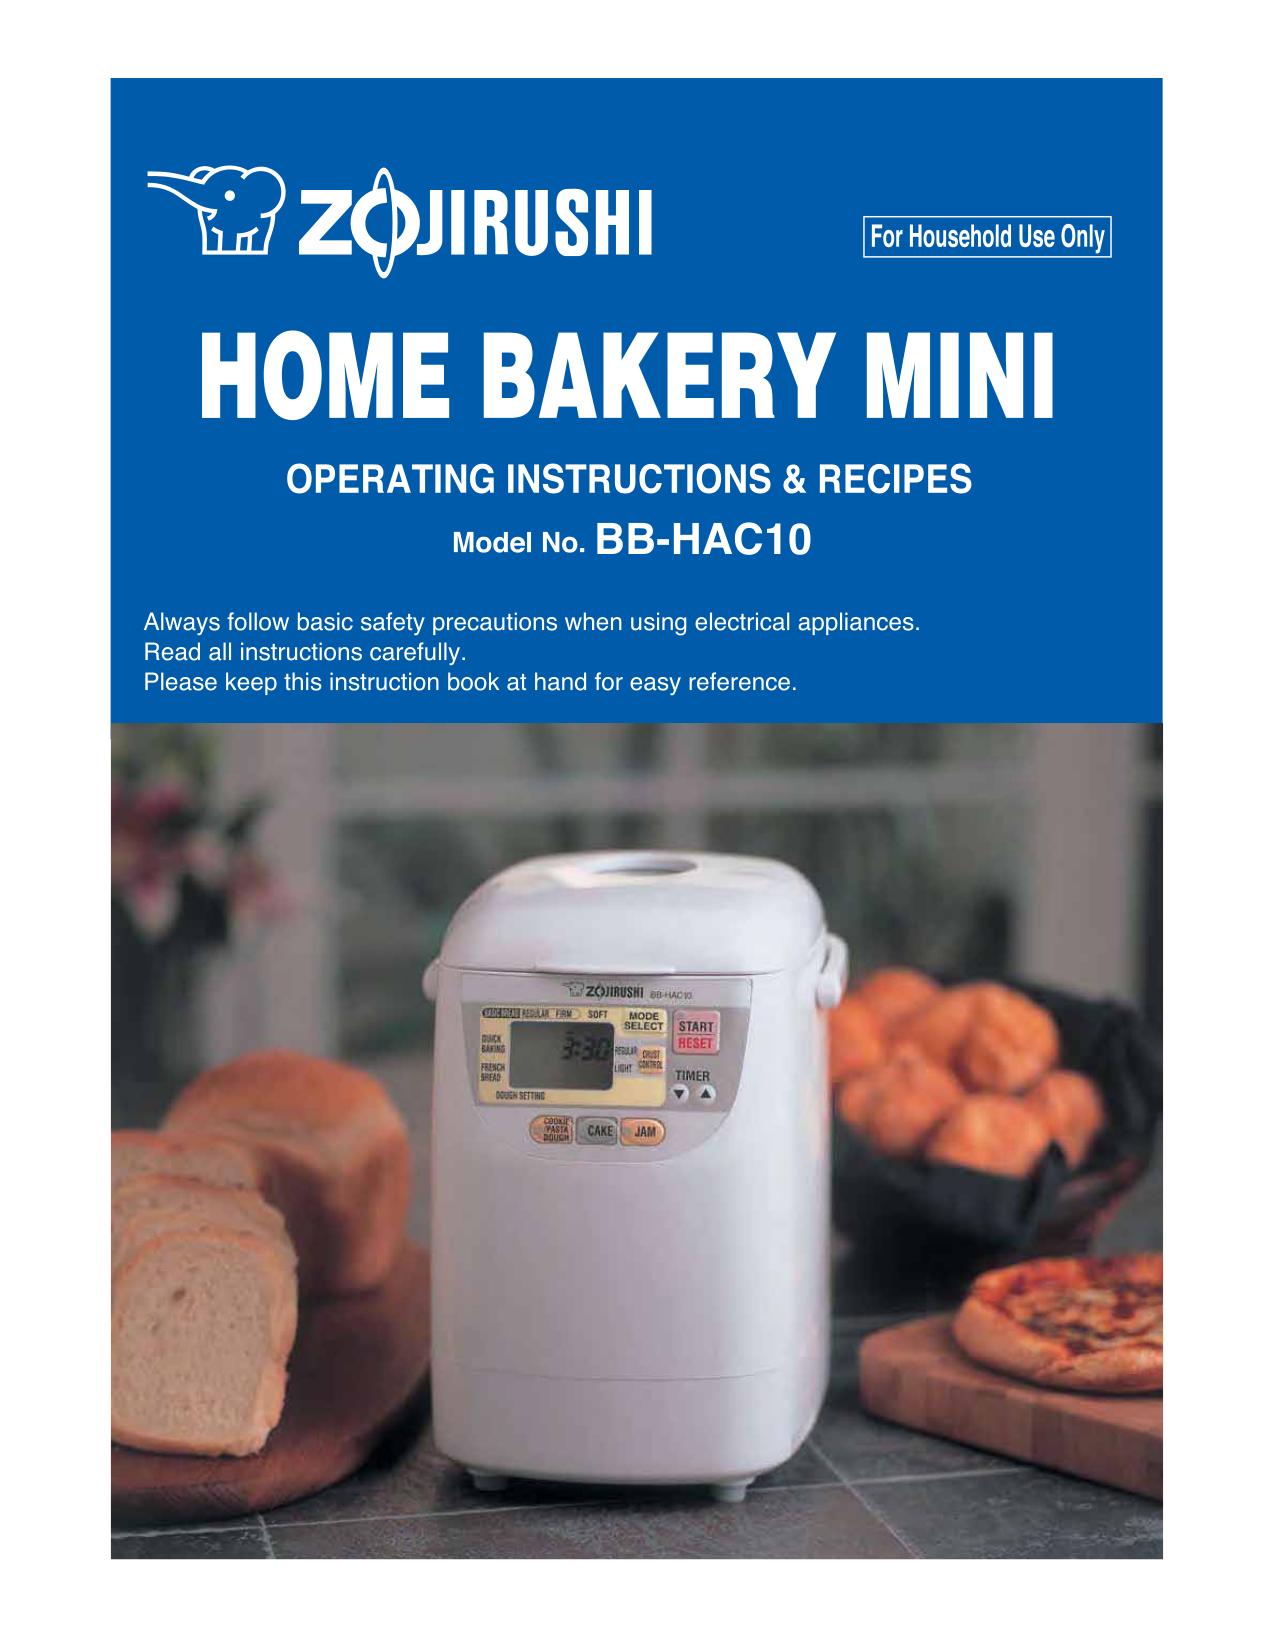 zojirushi bread machine manual